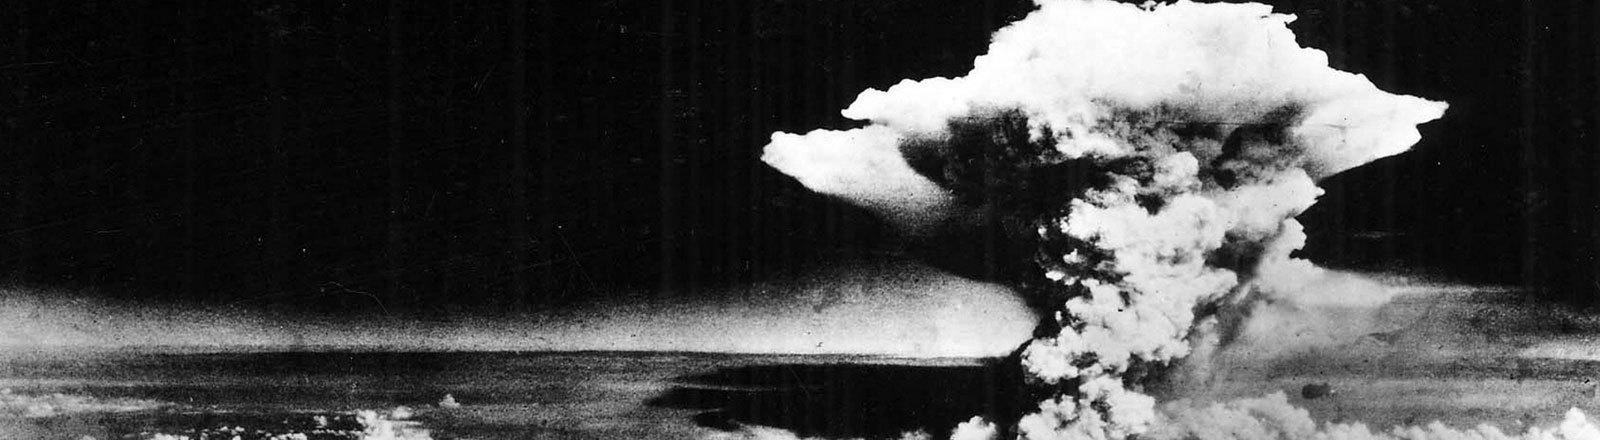 Atombombenexplosion Hiroshima 1945